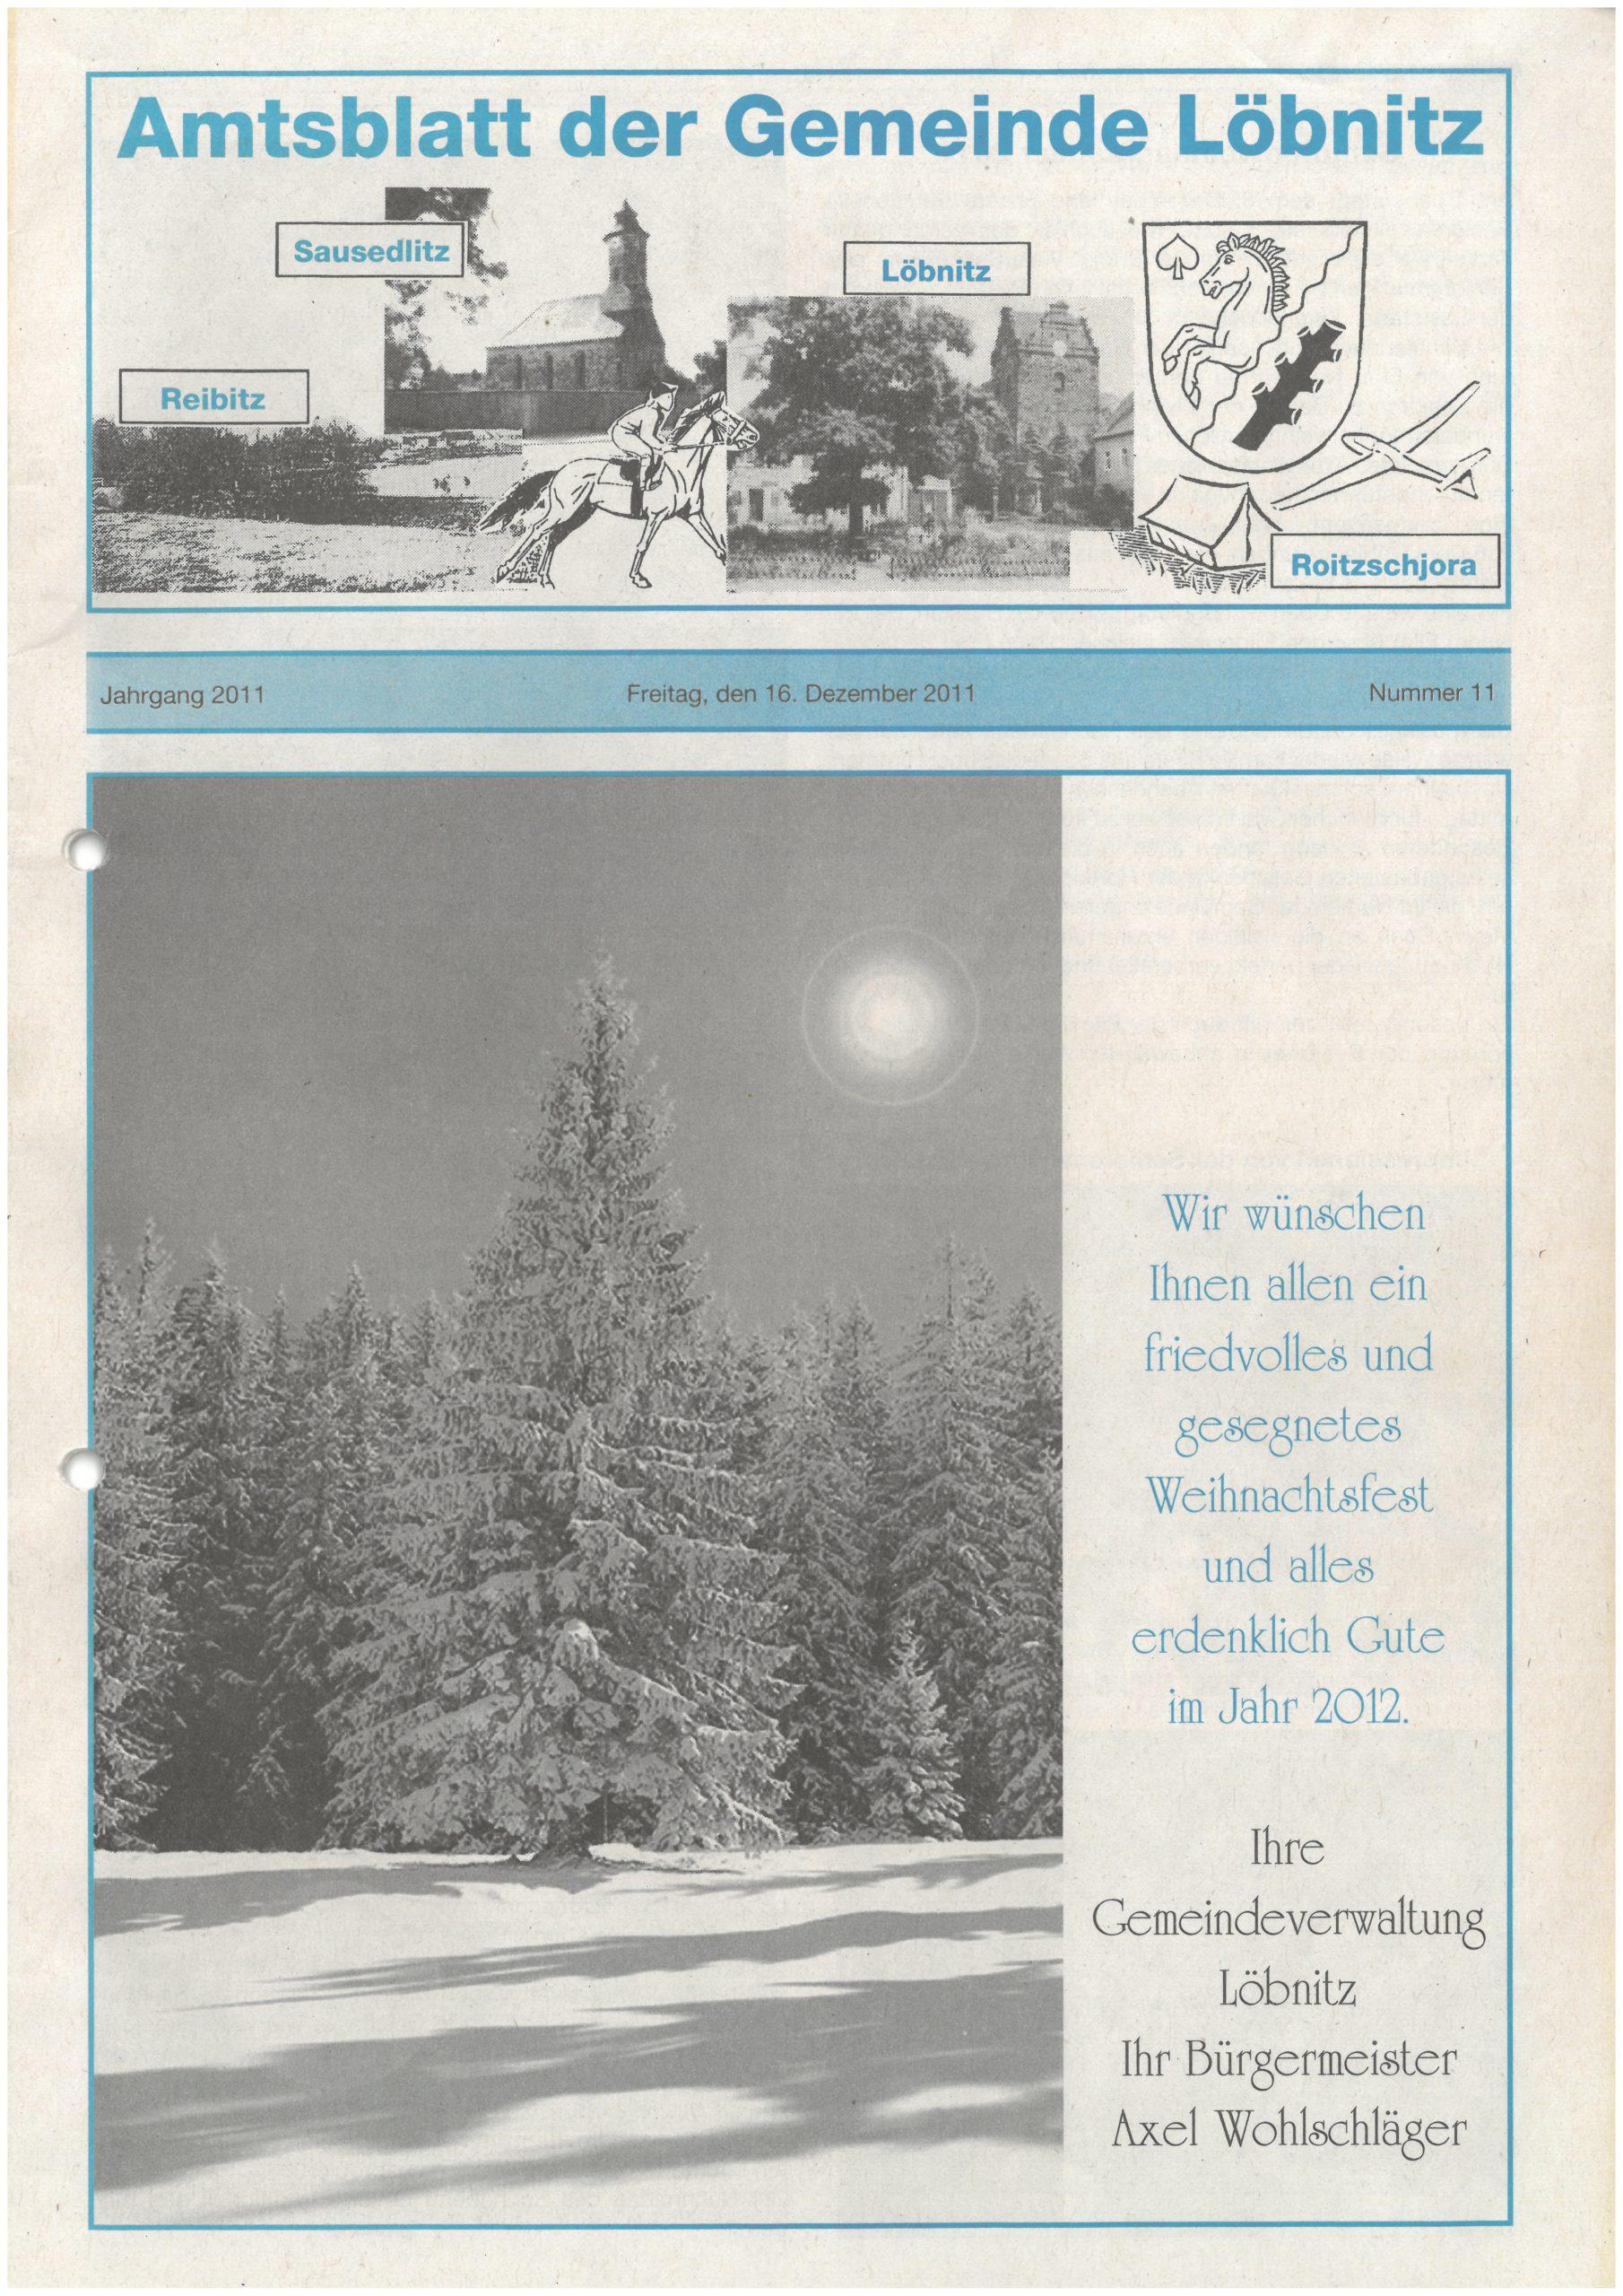 2020 11 20 Loebnitz Ausgabe 11 Titelbild